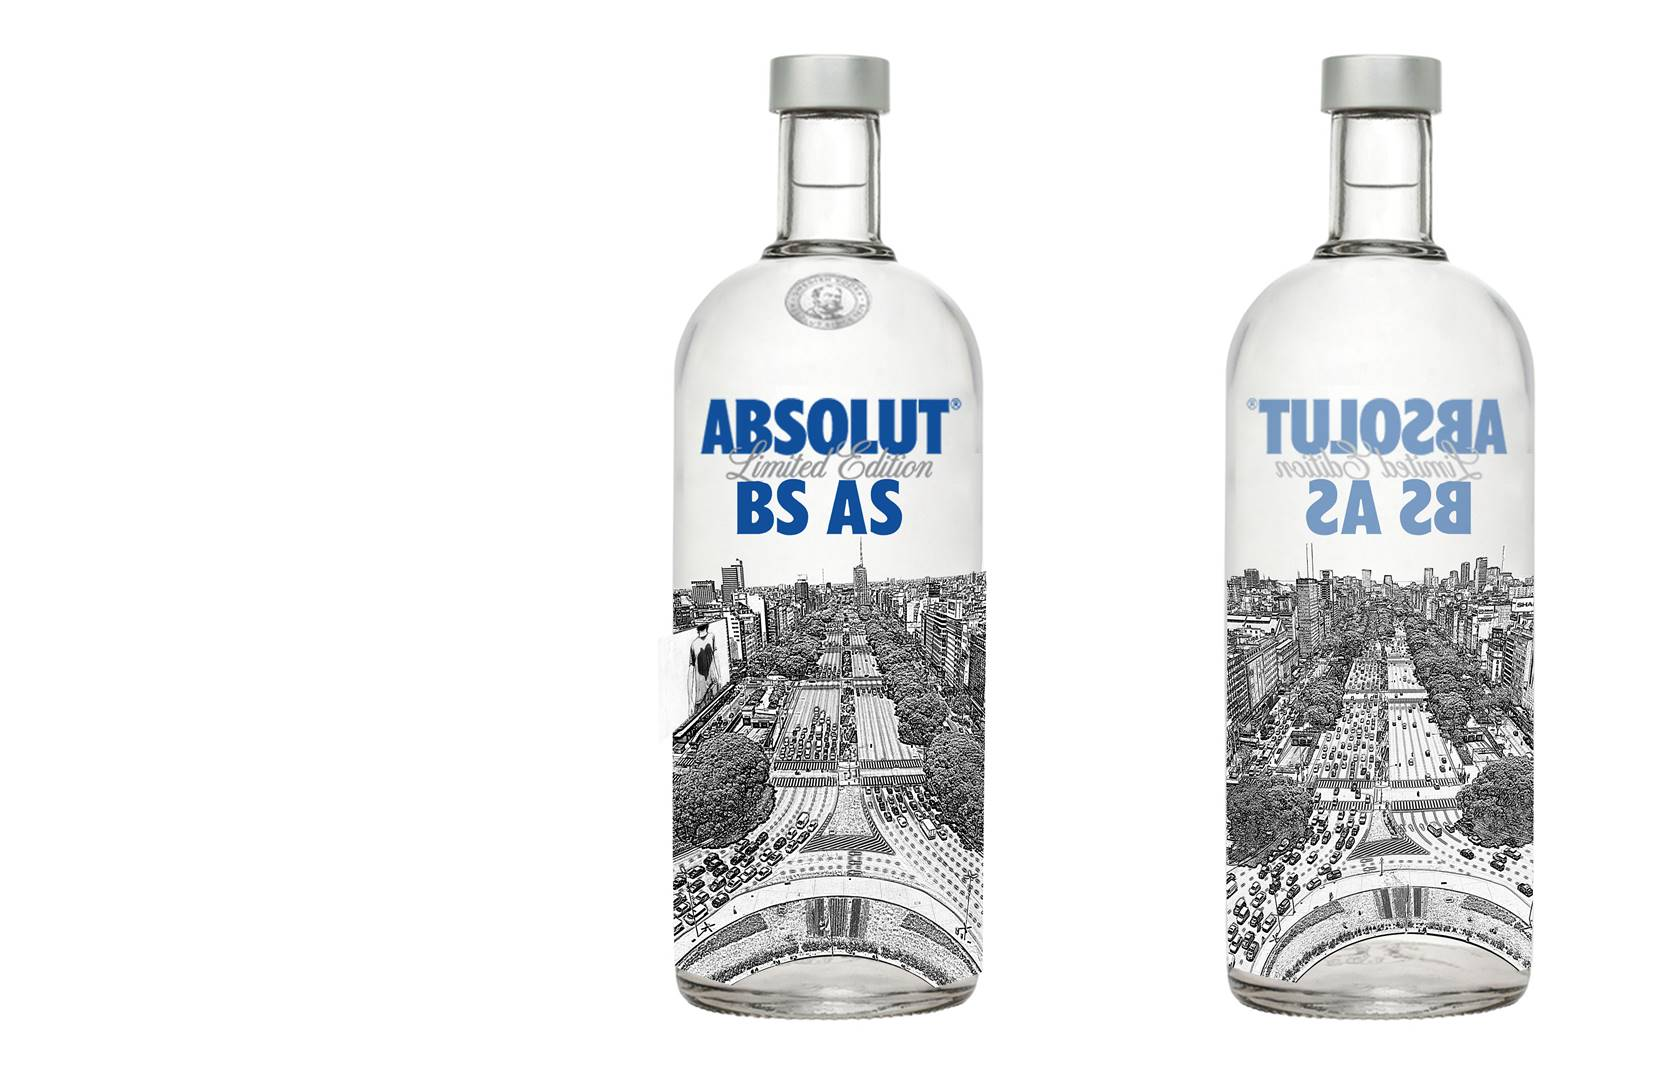 Absolut Buenos Aires by Gaspar Libedinsky - concepto inicial- ph Gaspar Libedinsky (Copy)